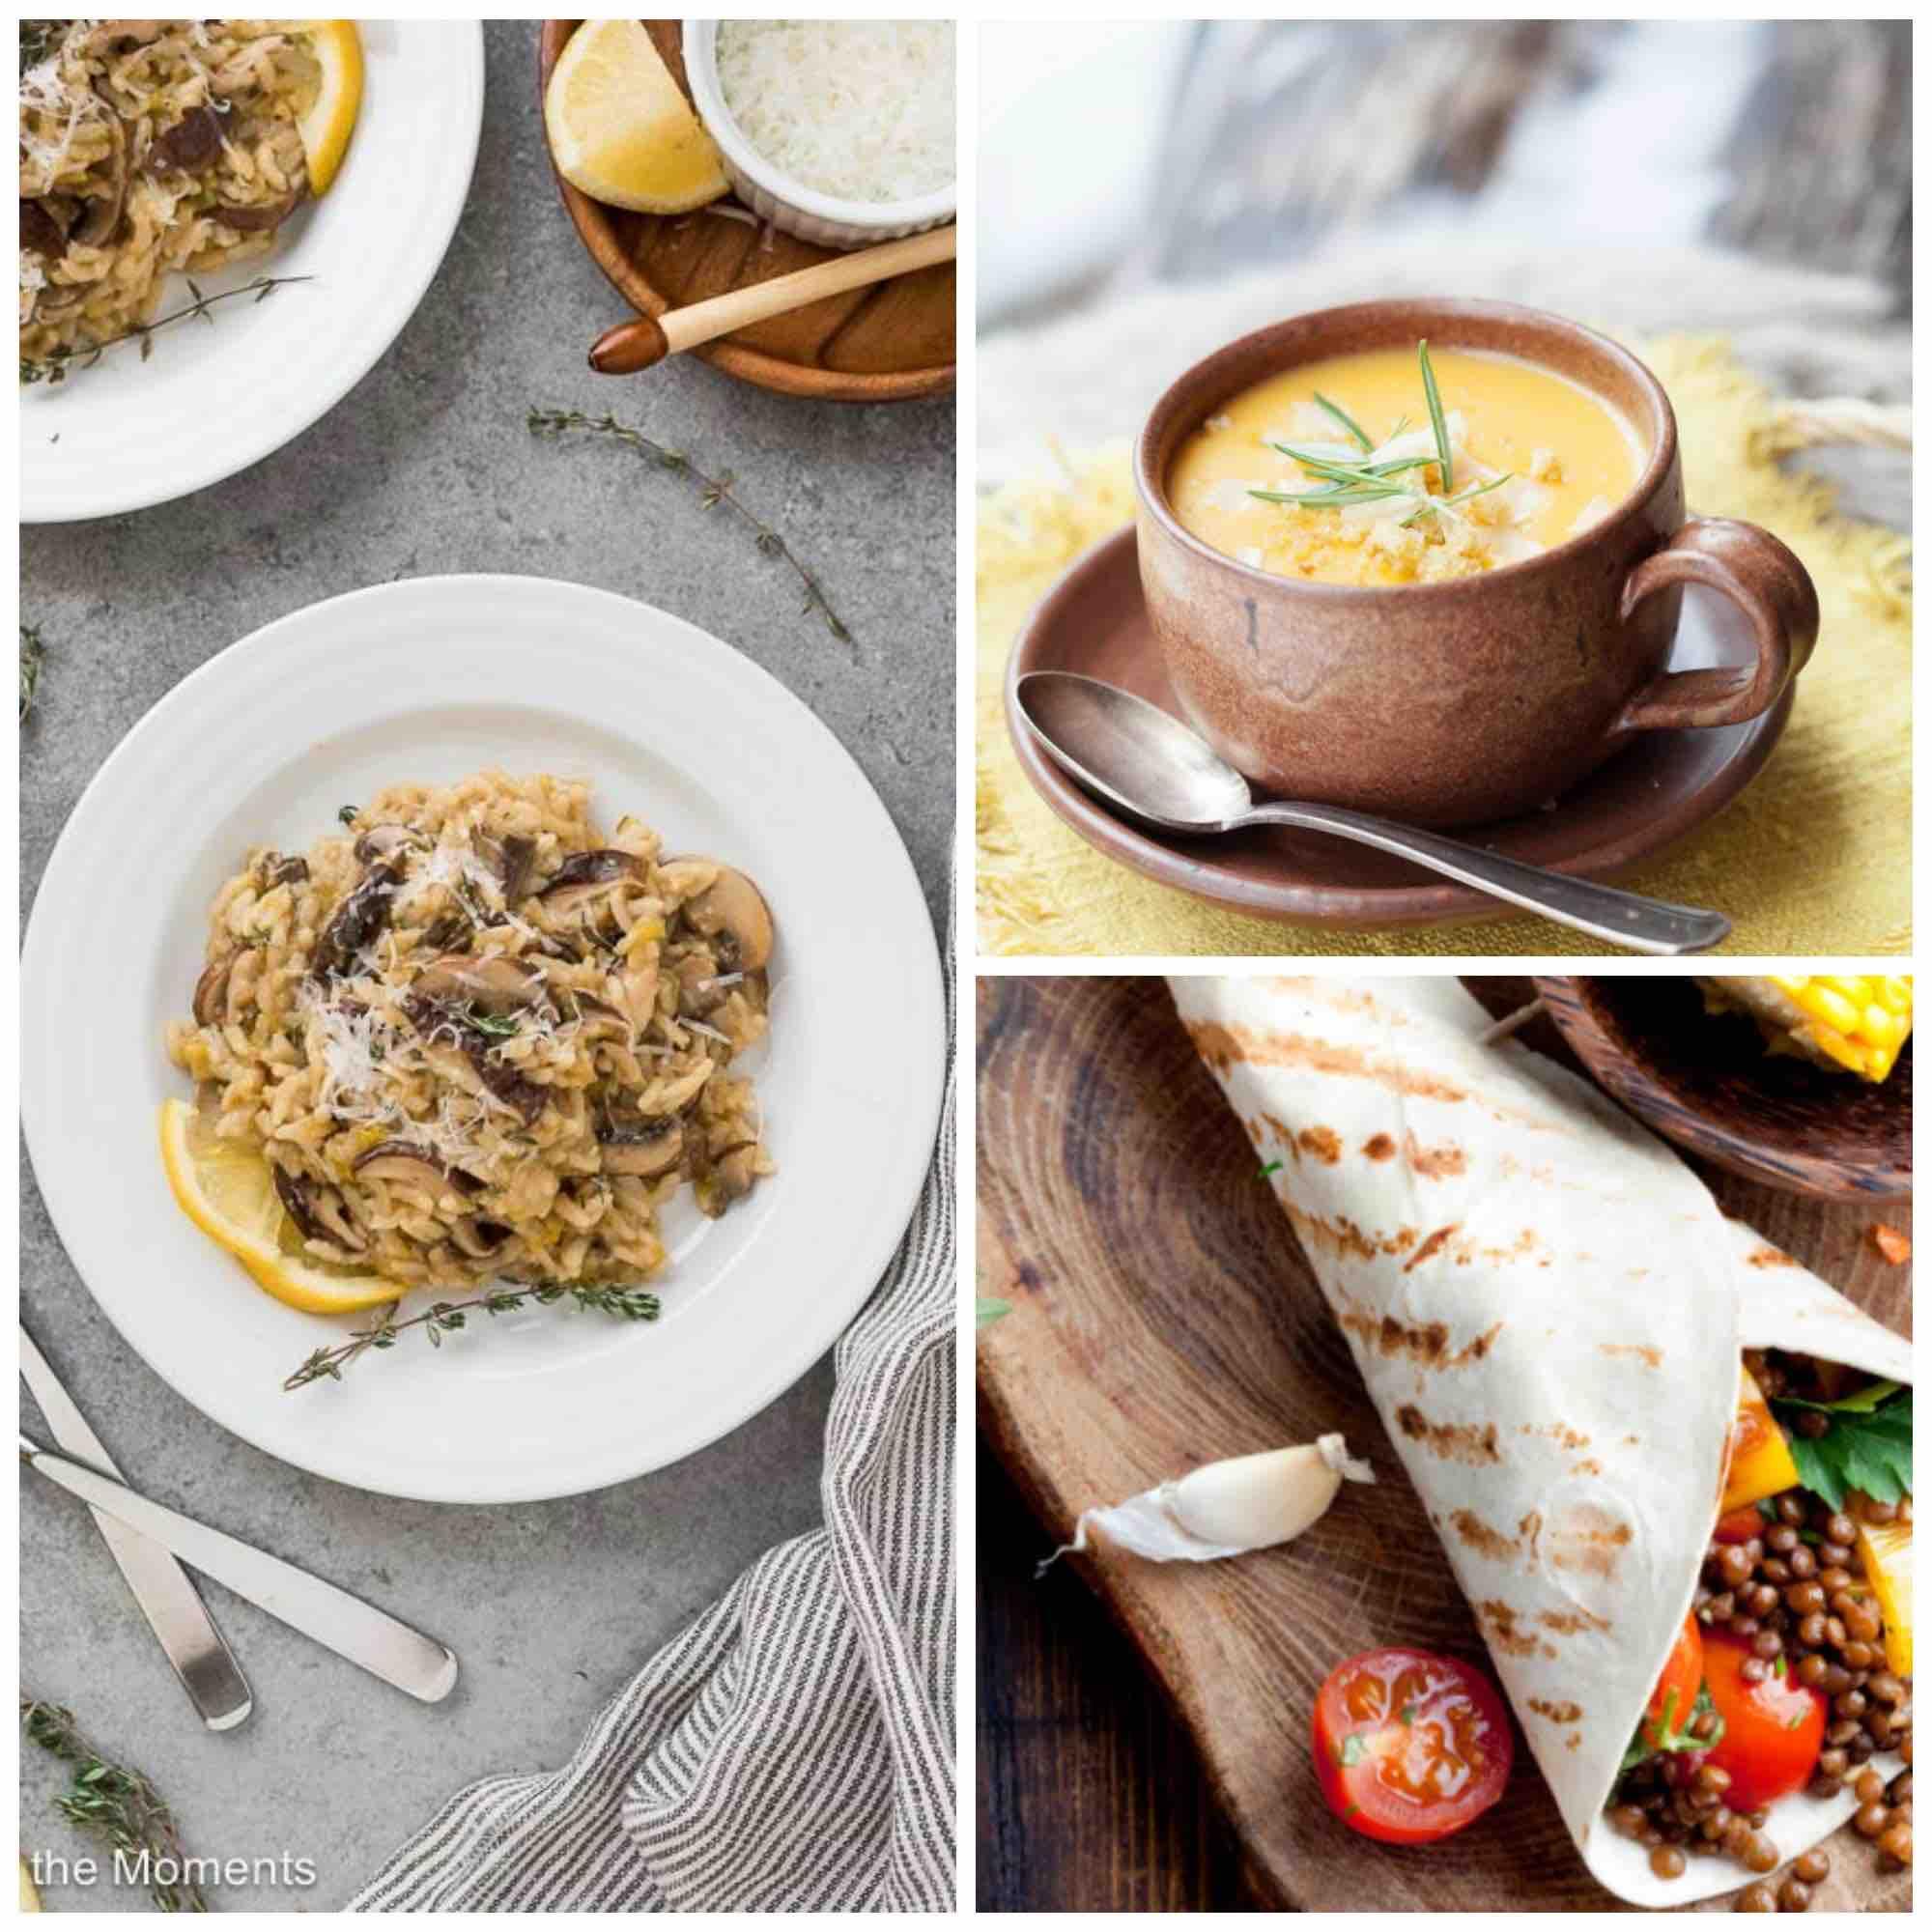 Meatless Instant Pot Recipes